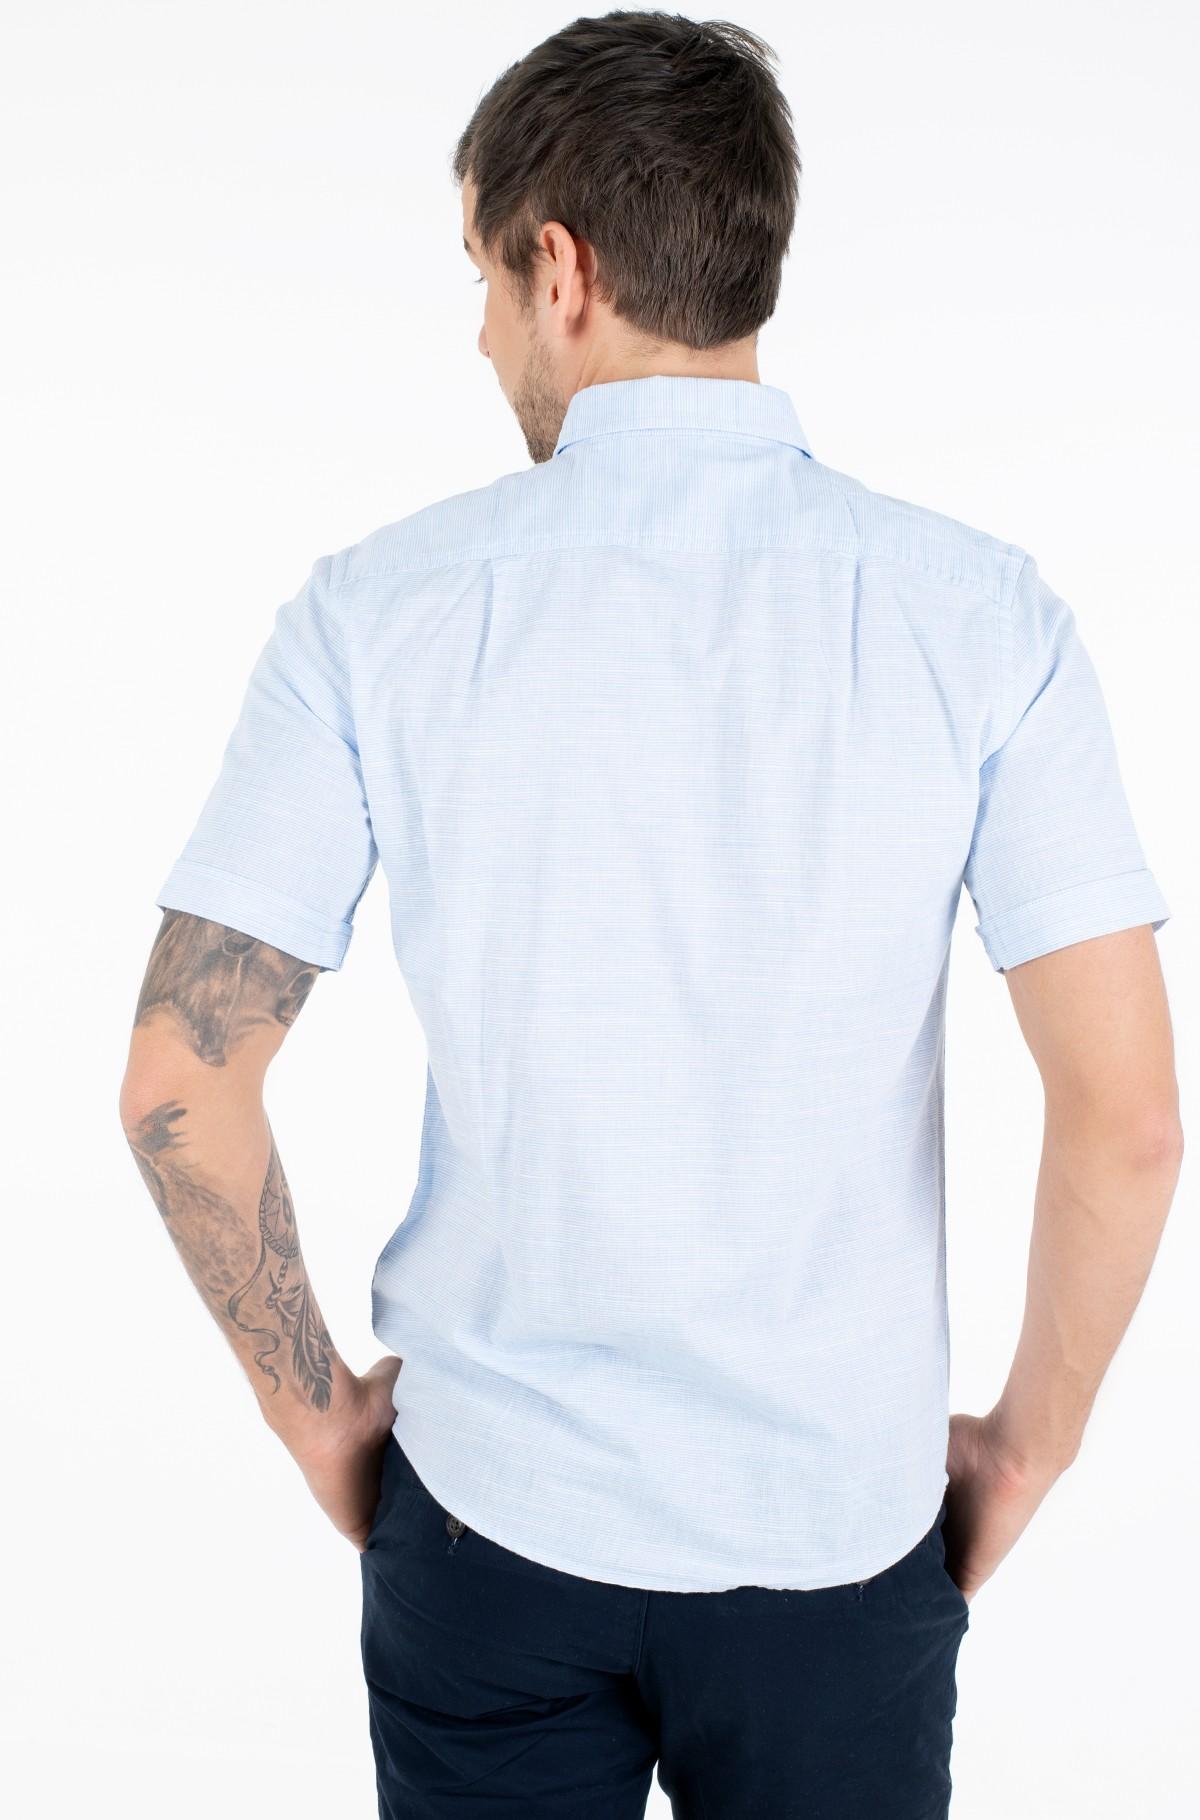 Marškiniai su trumpomis rankovėmis DOCKSIDE CHAMBRAY SS SHIRT-full-2